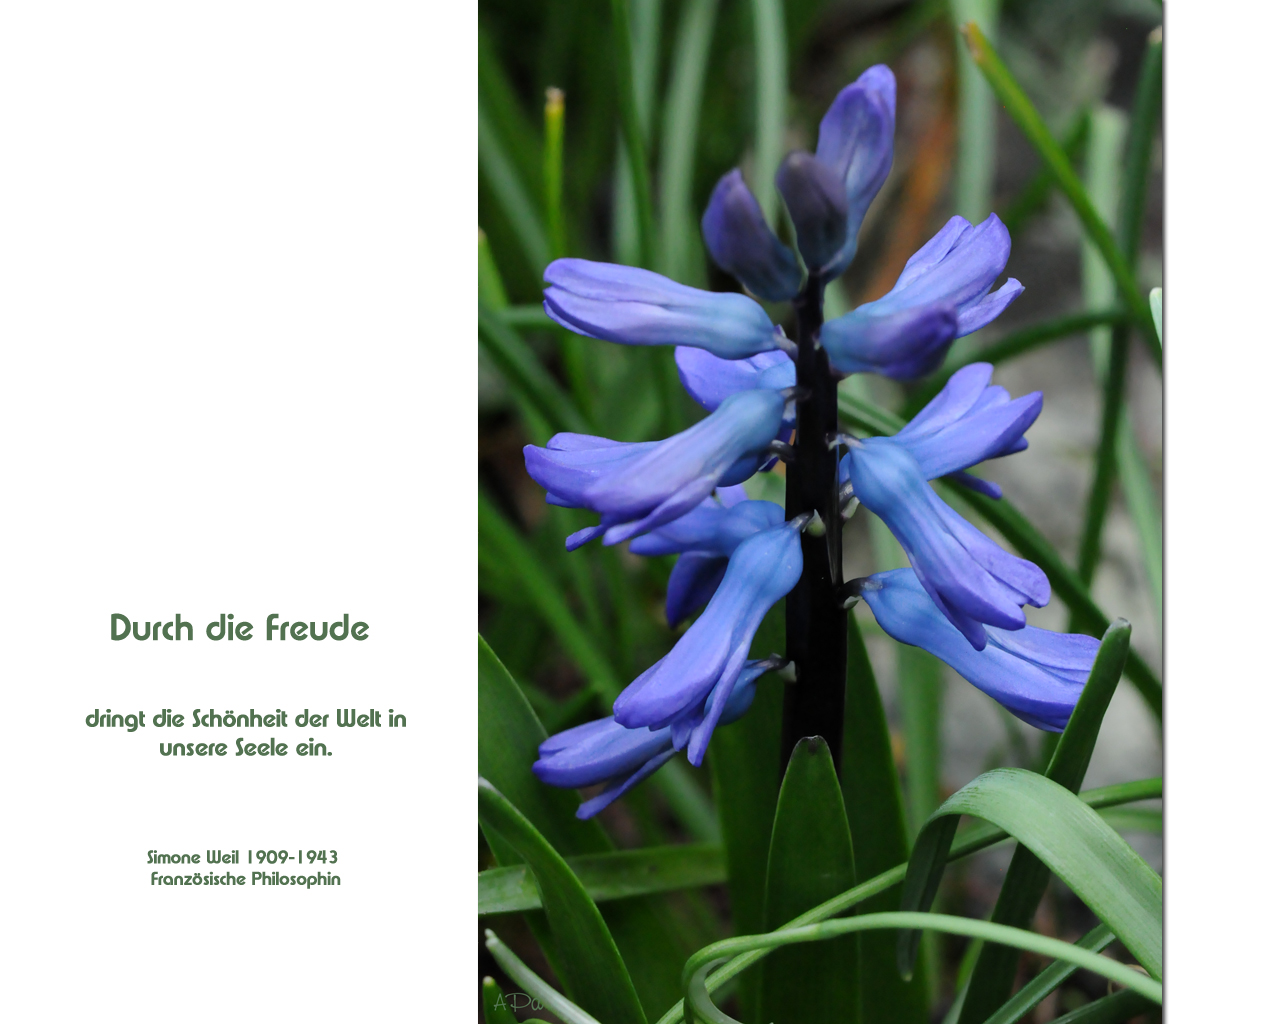 Hyazinthe in blau